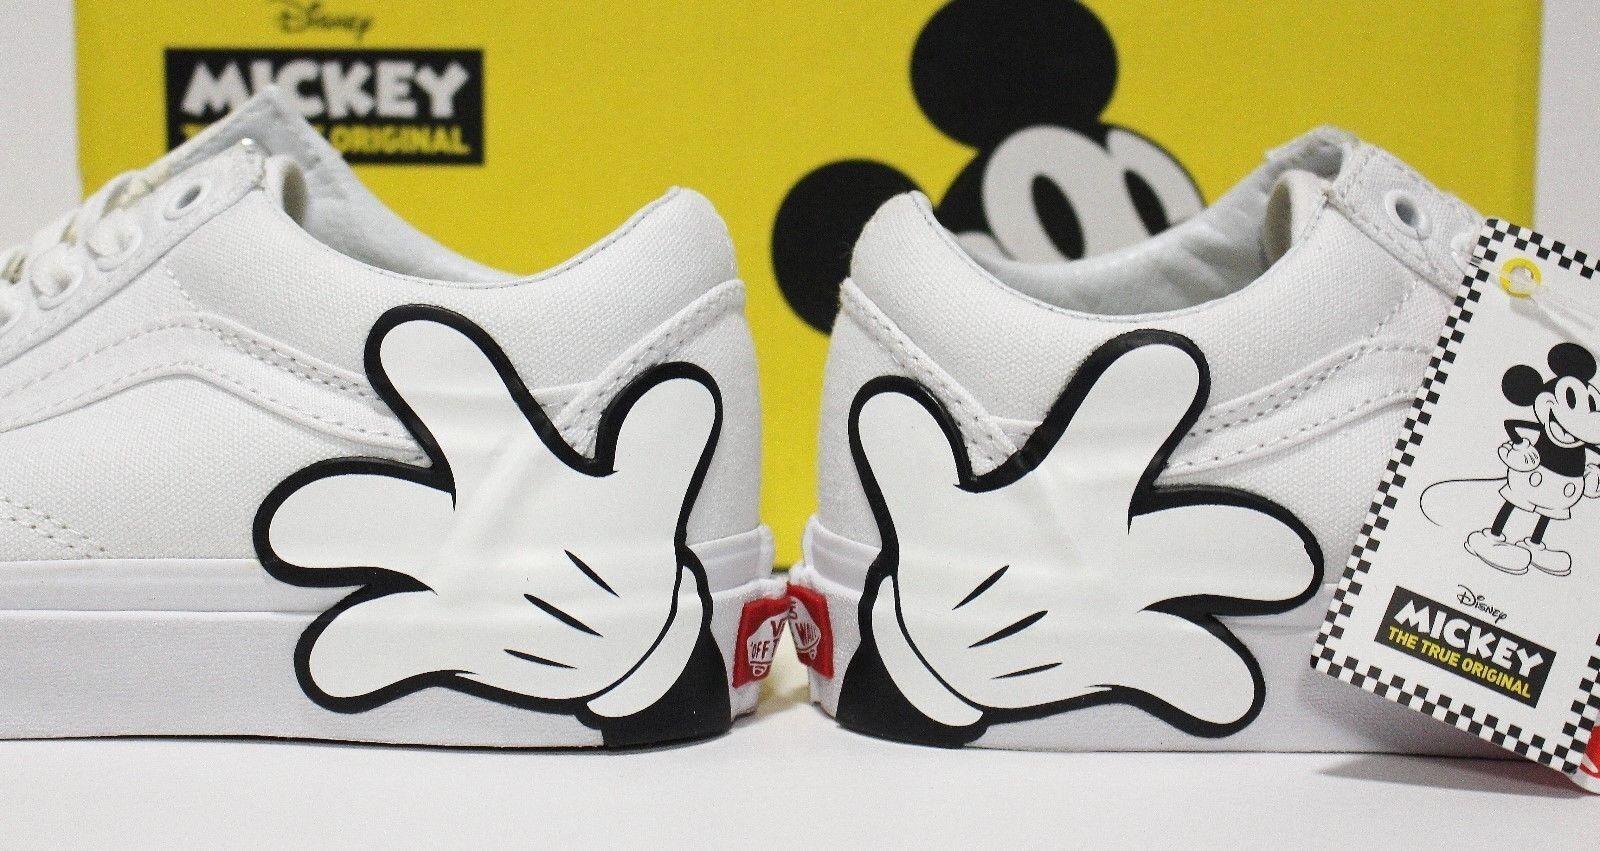 Vans X Disney Old Skool Mickey Mickey Mickey True bianca Donna  Dimensione 5 () (EUR 34.5) 26e08c